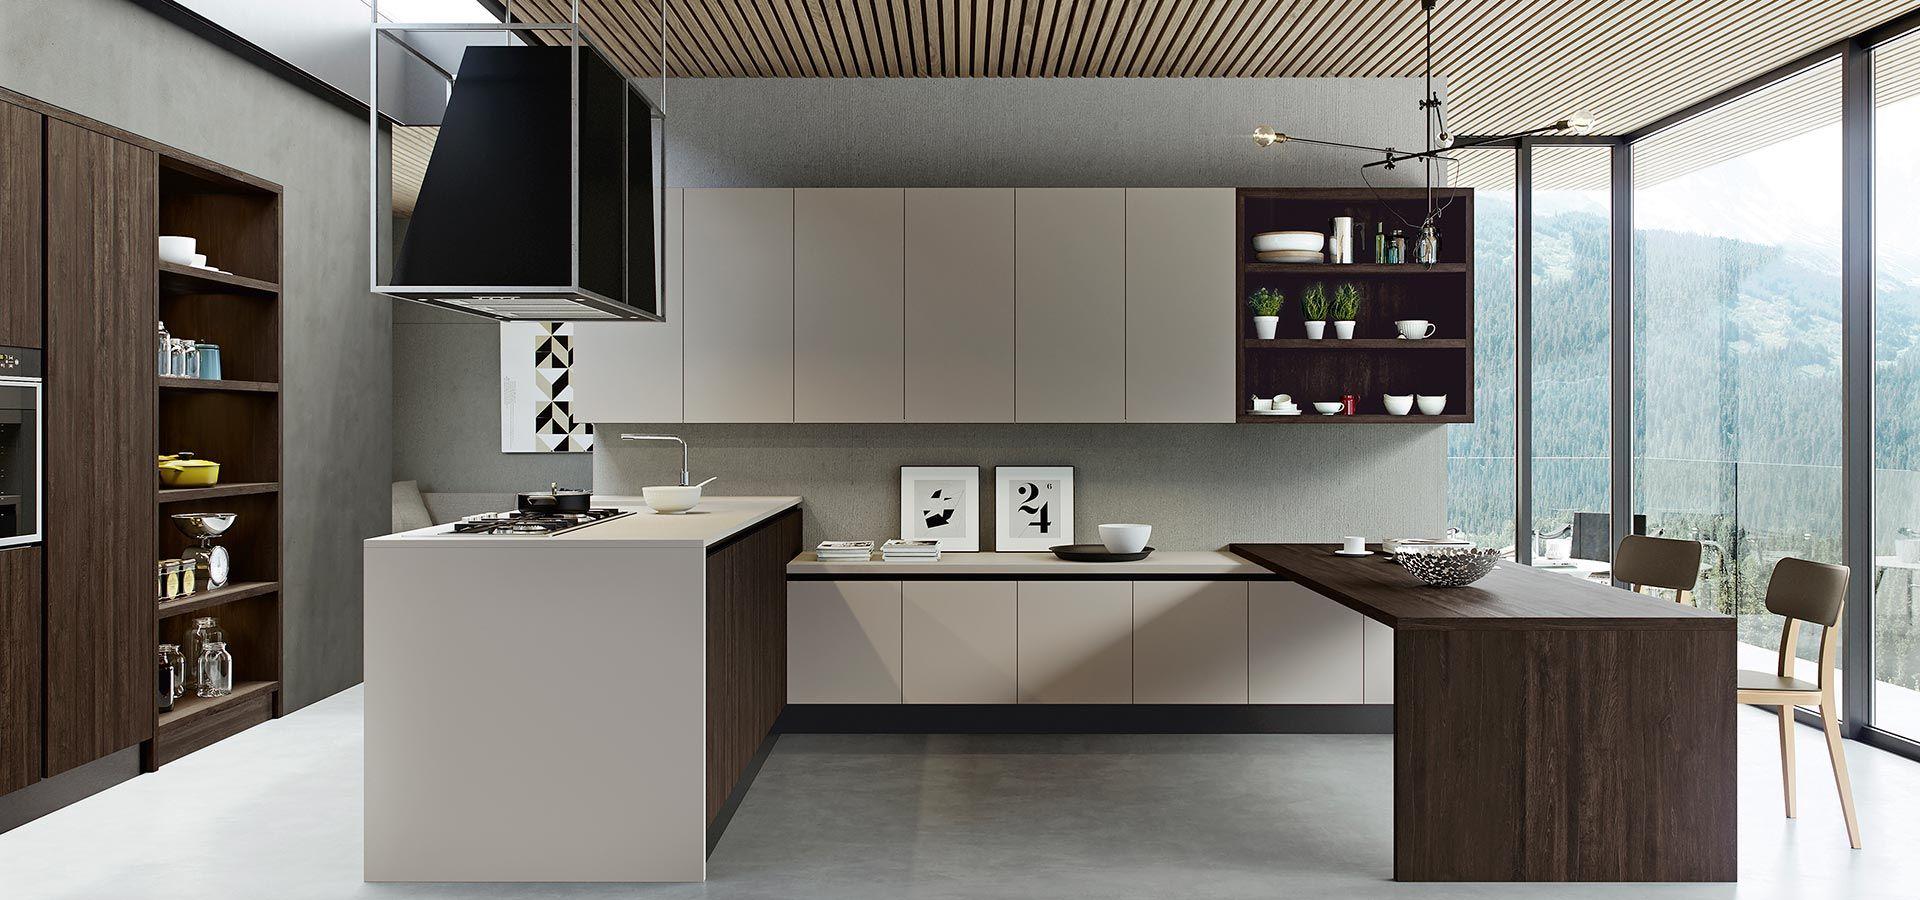 Cucina moderna kal finitura rovere termocotto e maxximatt mokaccino piano in laminato - Laminato in cucina ...